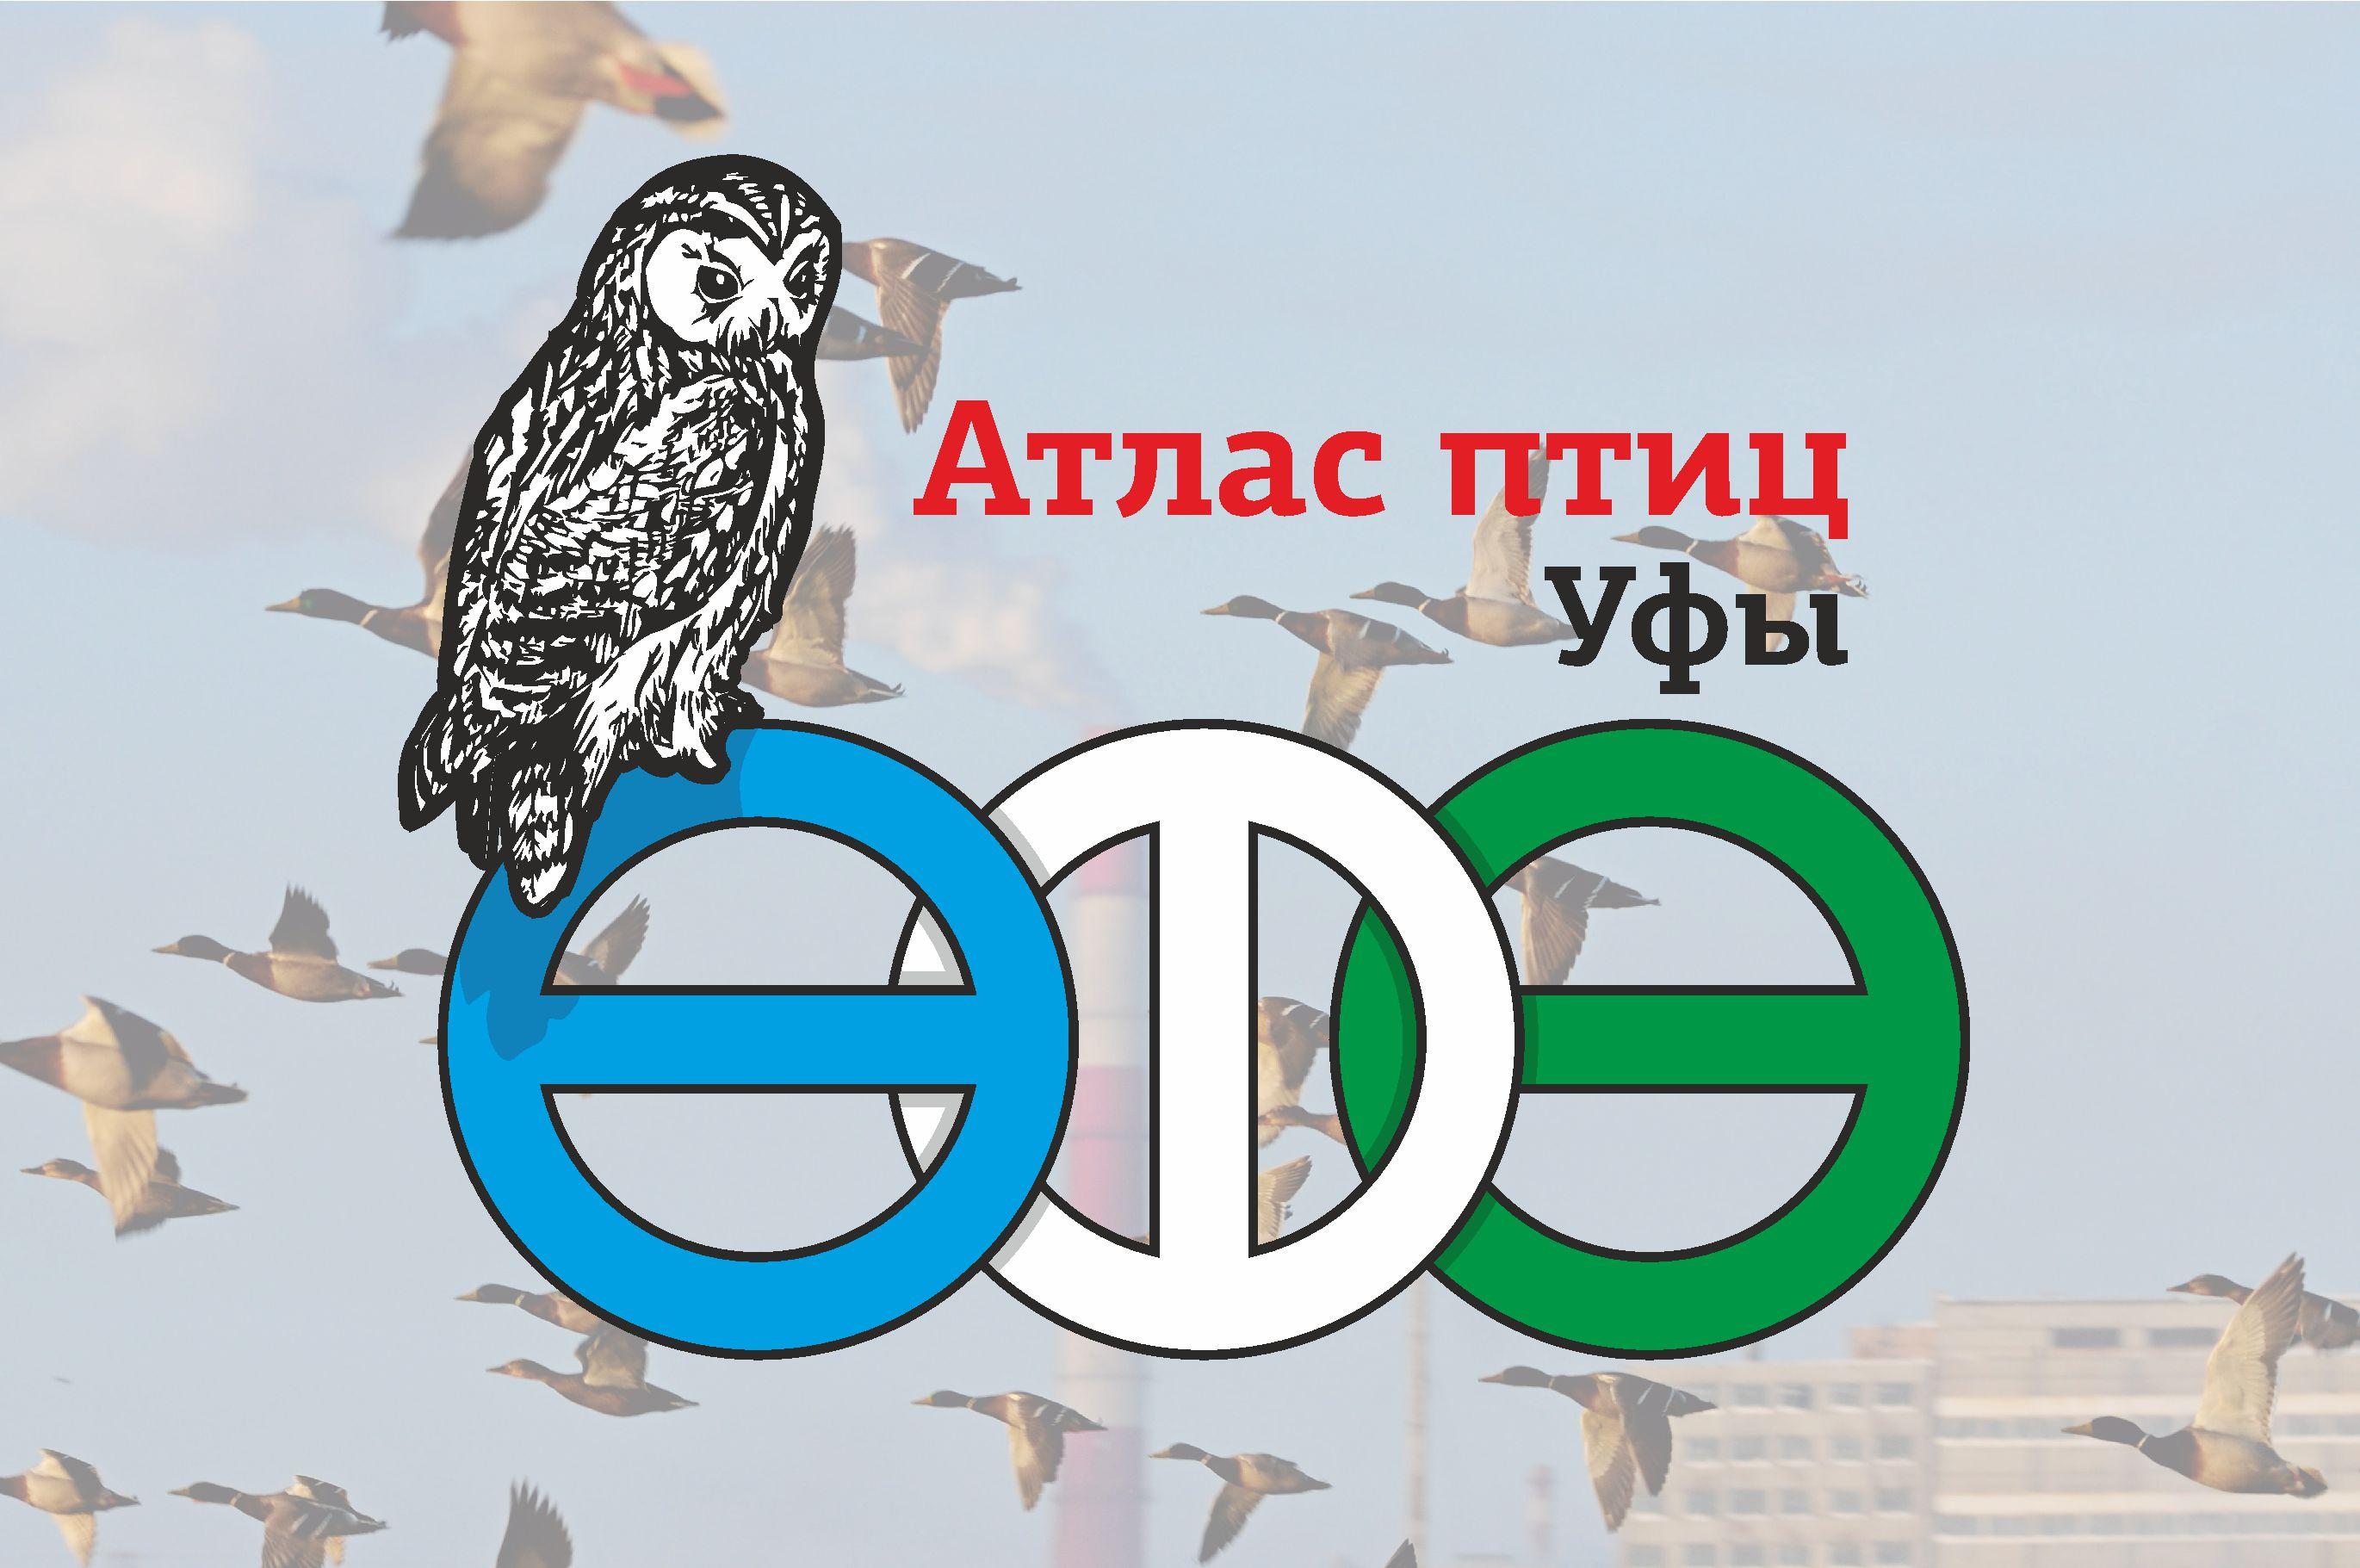 Проект создания Атласа птиц города Уфы – итоги сезона 2017-2018 гг.